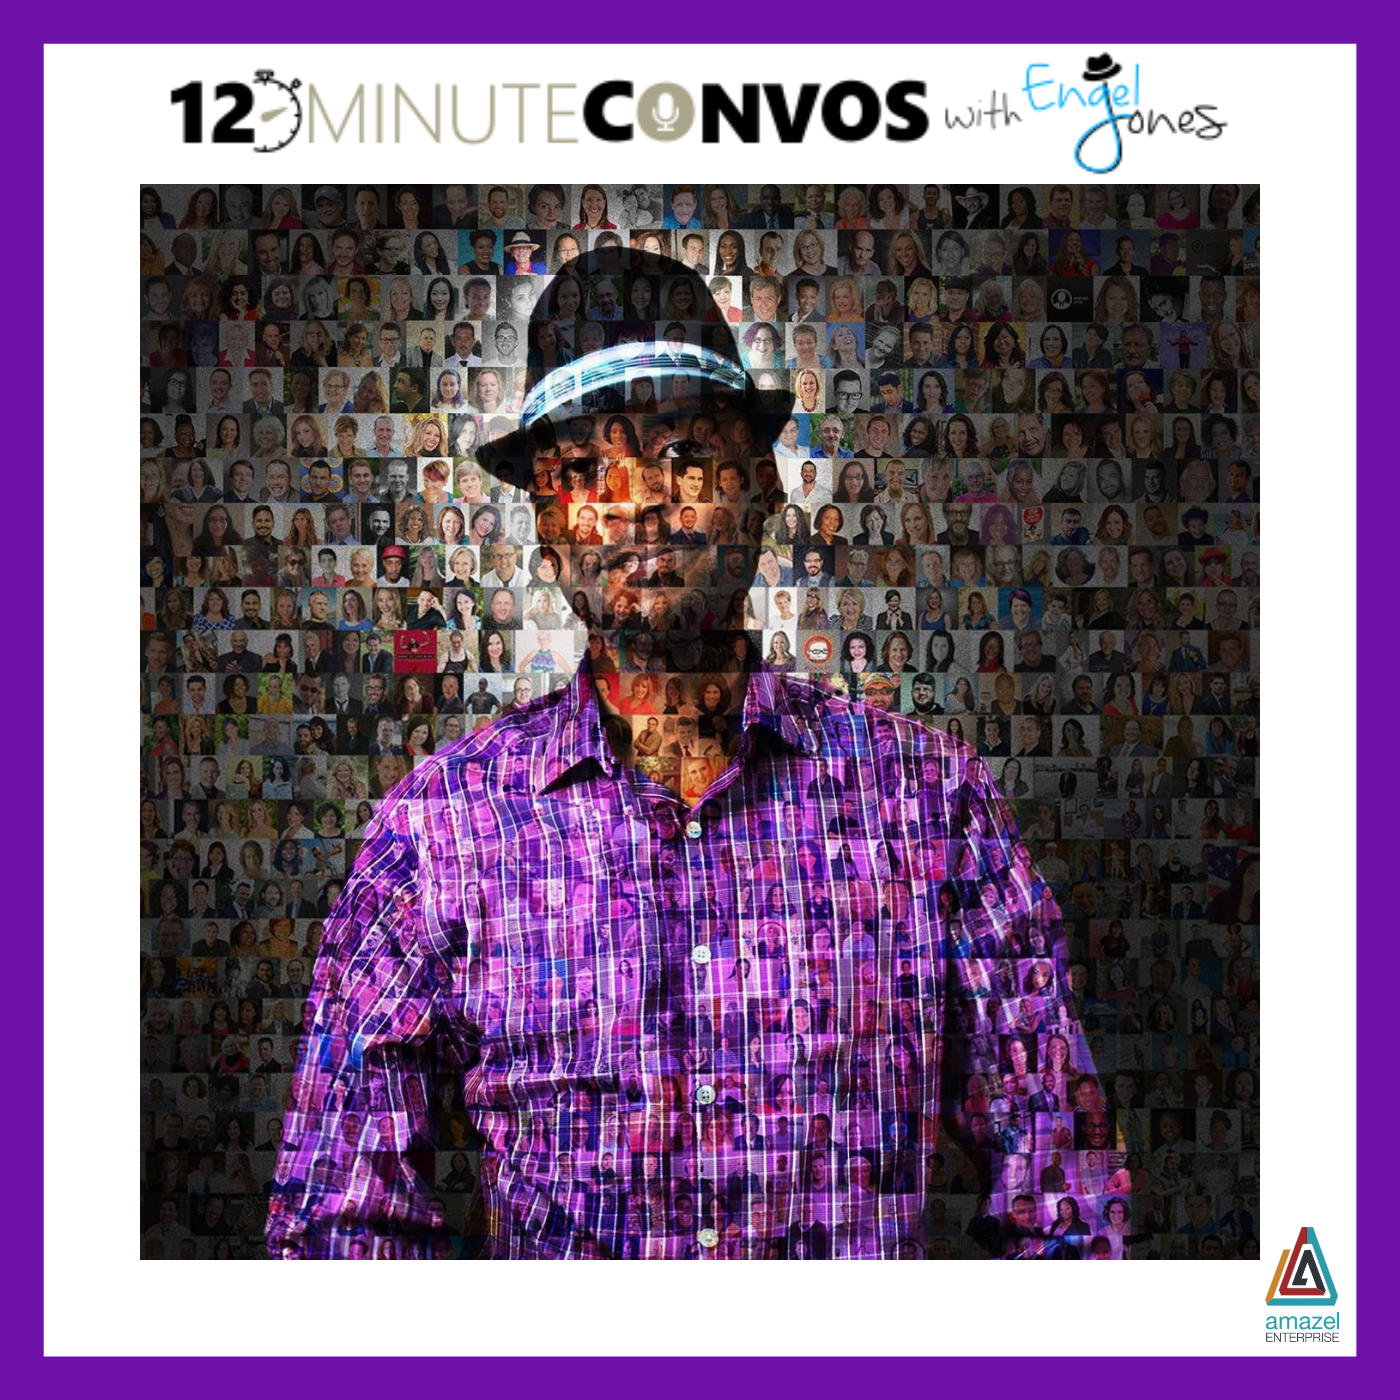 #12minconvos show art